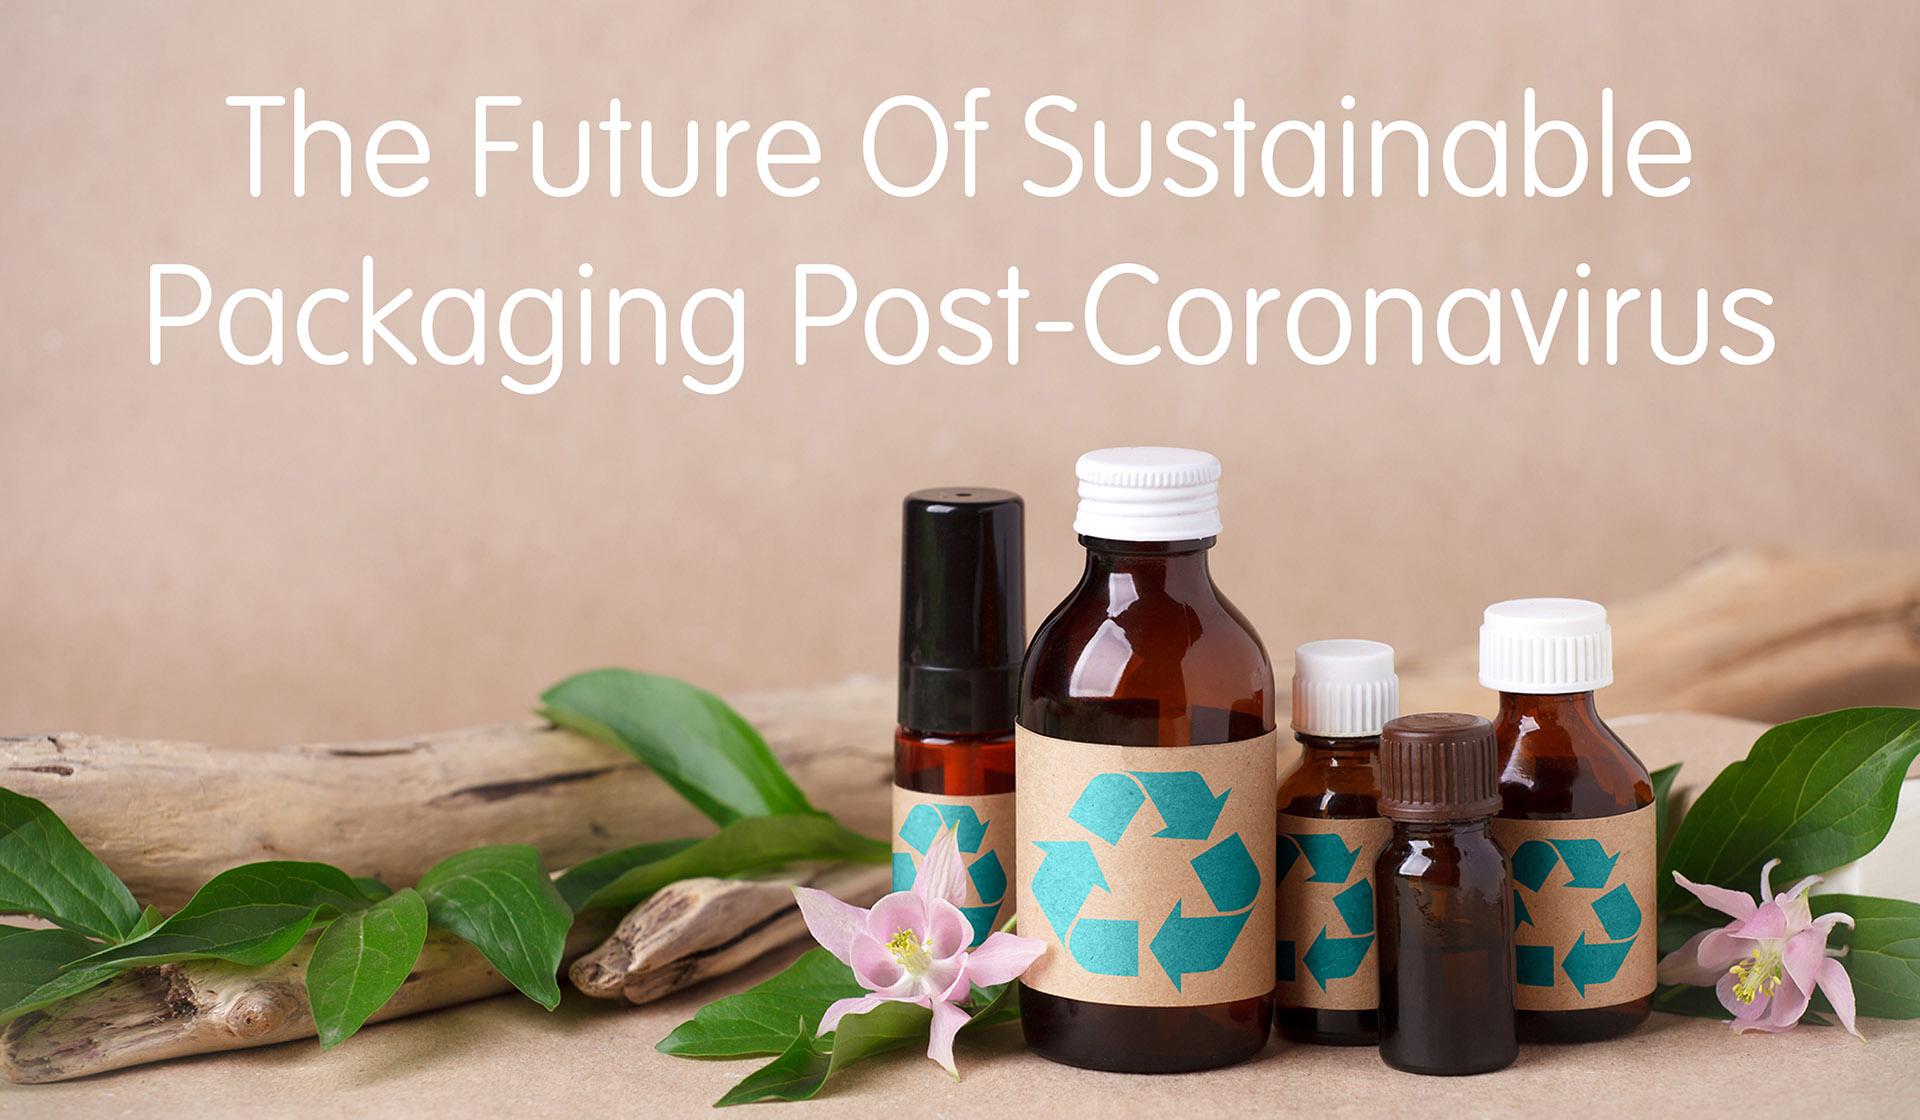 The Future of Sustainable Packaging Post-Coronavirus